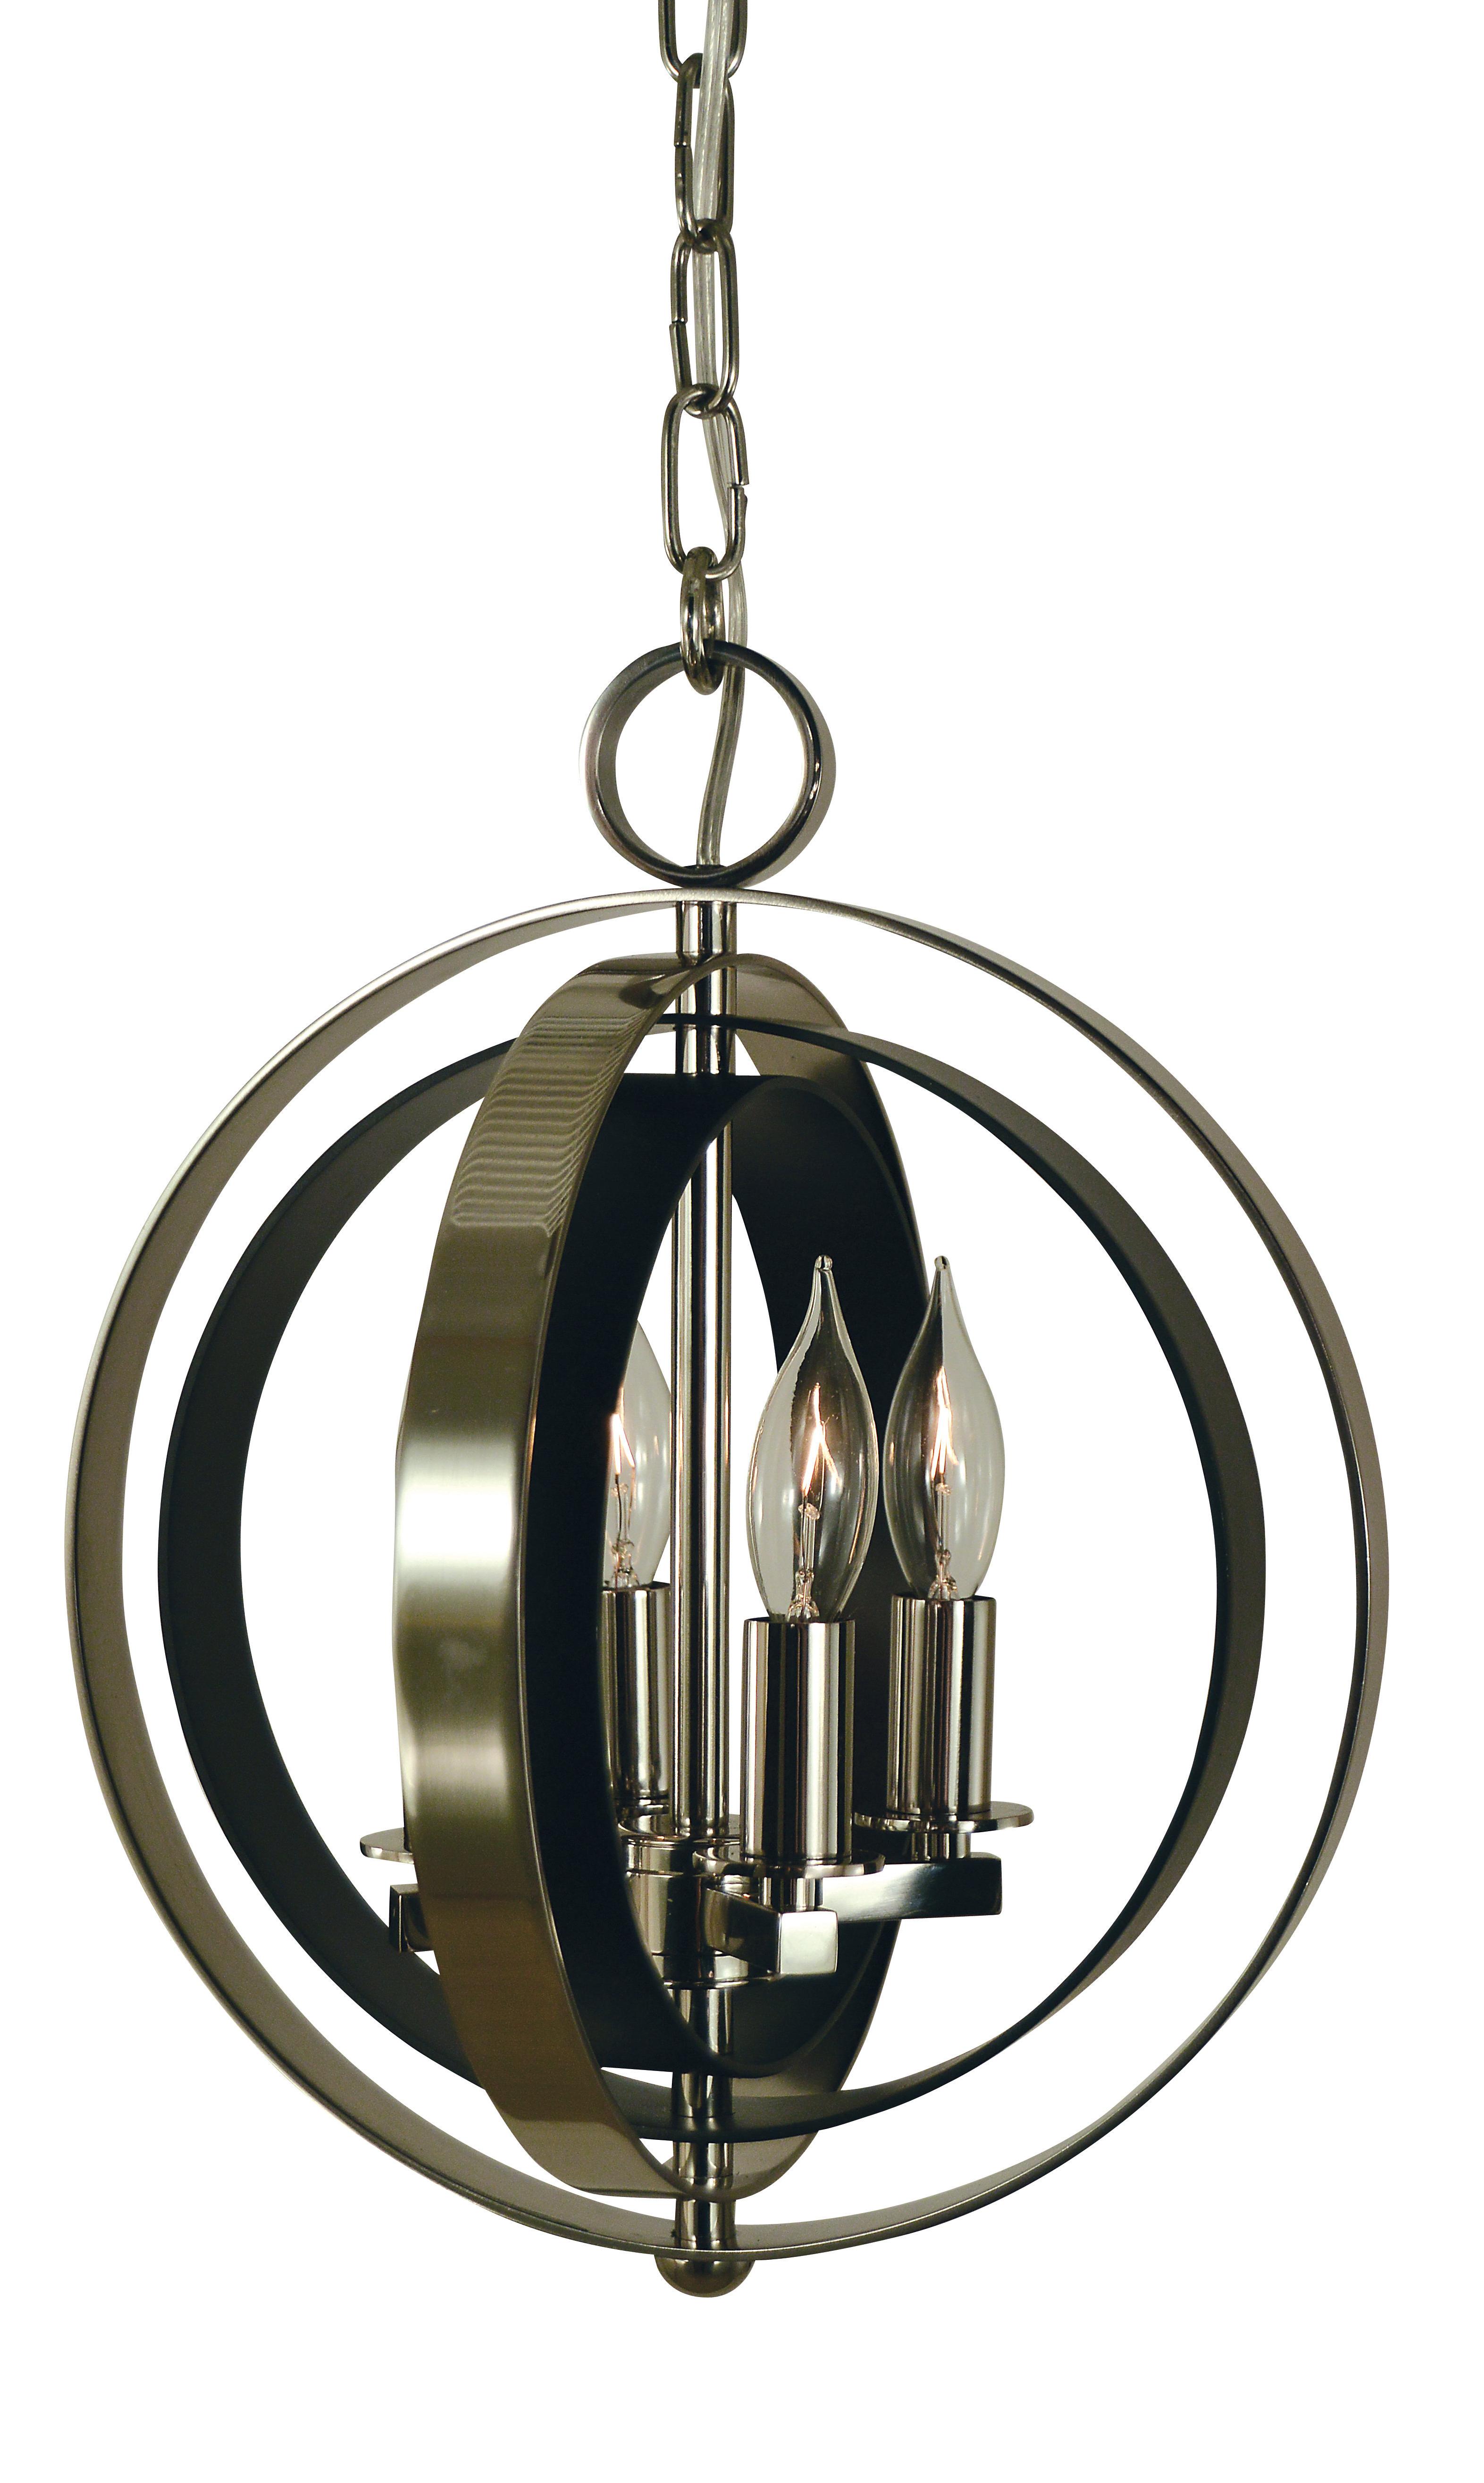 Rossi Industrial Vintage 1 Light Geometric Pendants For Most Recent Alcott Hill Parenteau 4 Light Globe Pendant (Gallery 11 of 20)